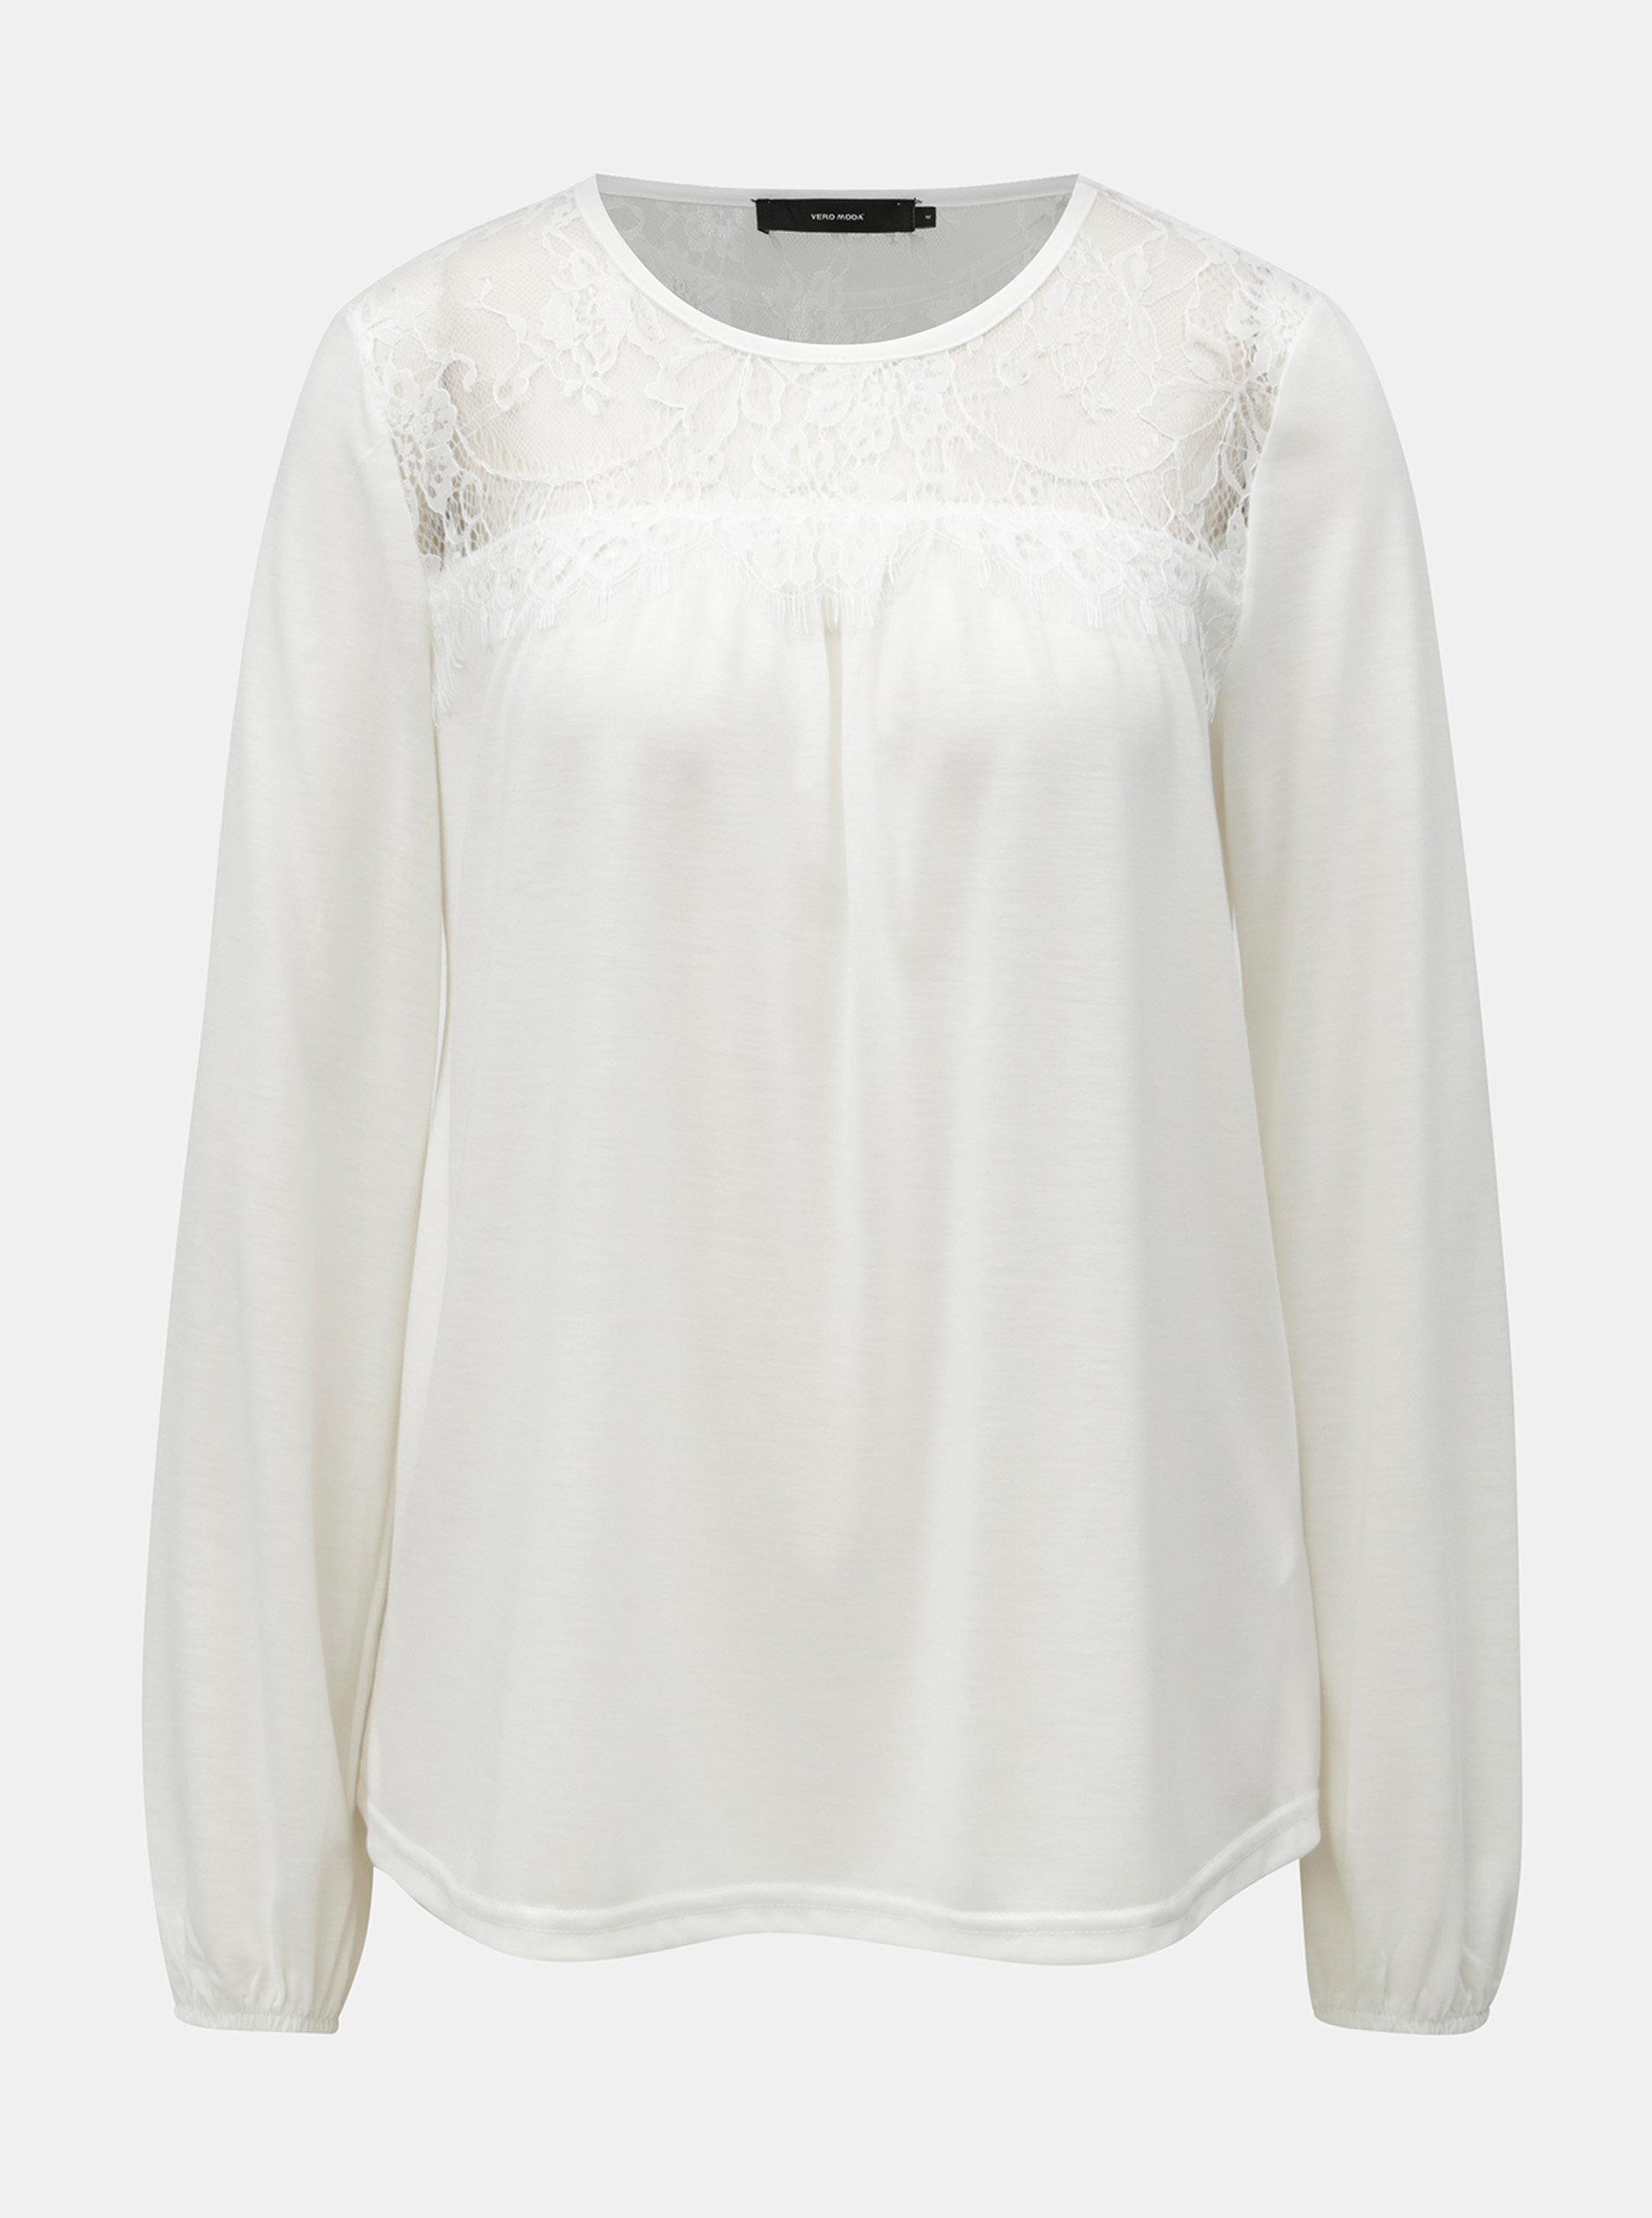 80a05d40a2 Bílé tričko s krajkovým sedlem VERO MODA ...